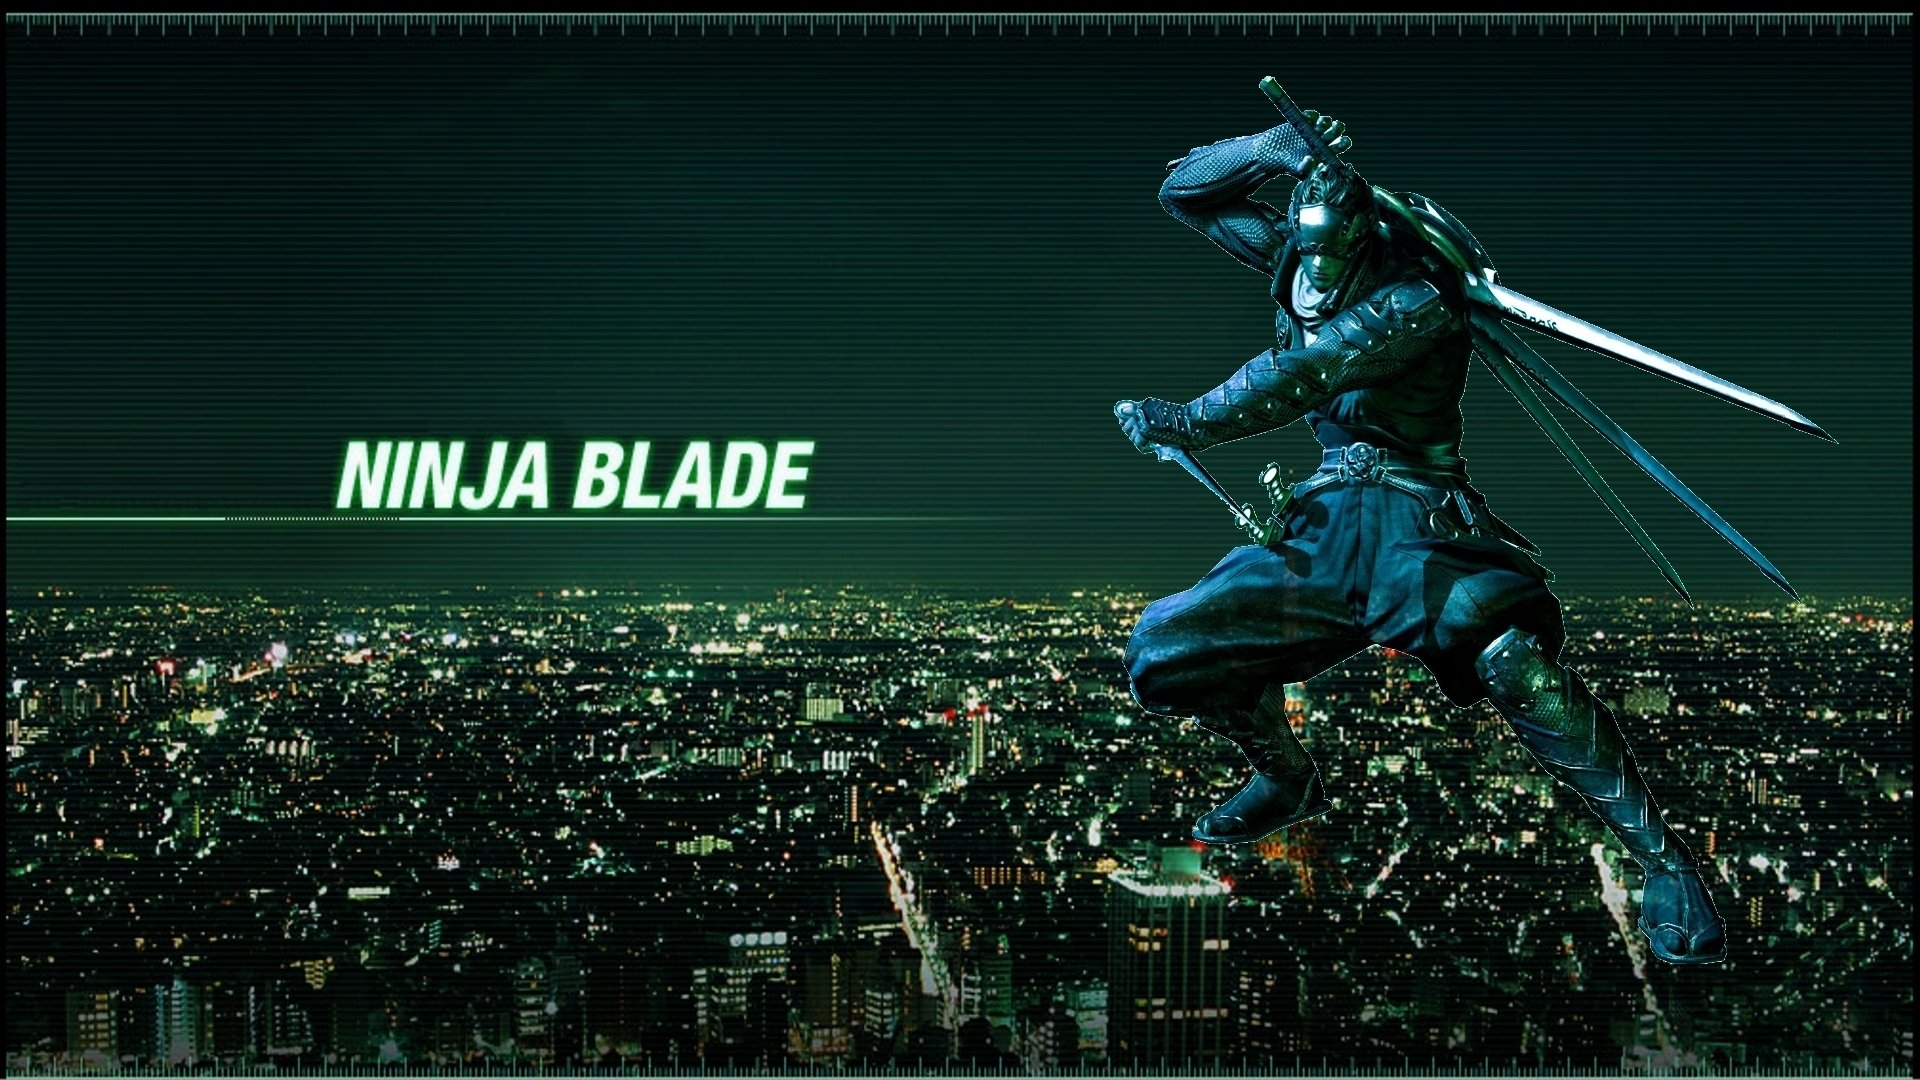 Ninja Blade HD Wallpaper | Background Image | 1920x1080 ...